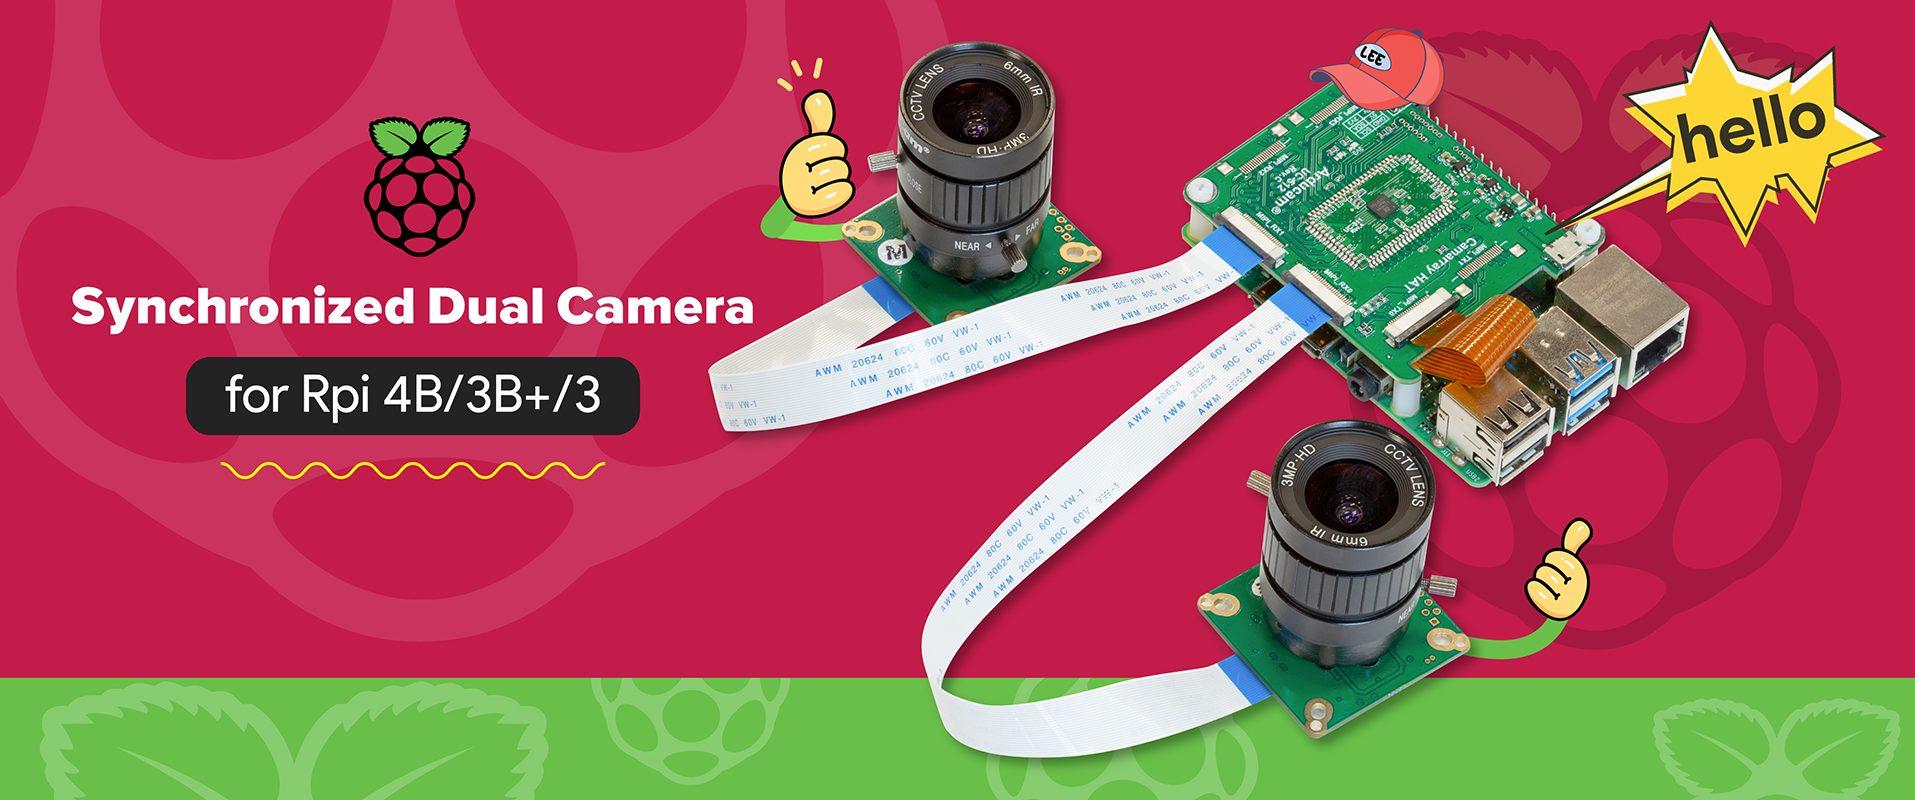 arducam synchronized stereo camera hat 12mp imx477 lee jackson